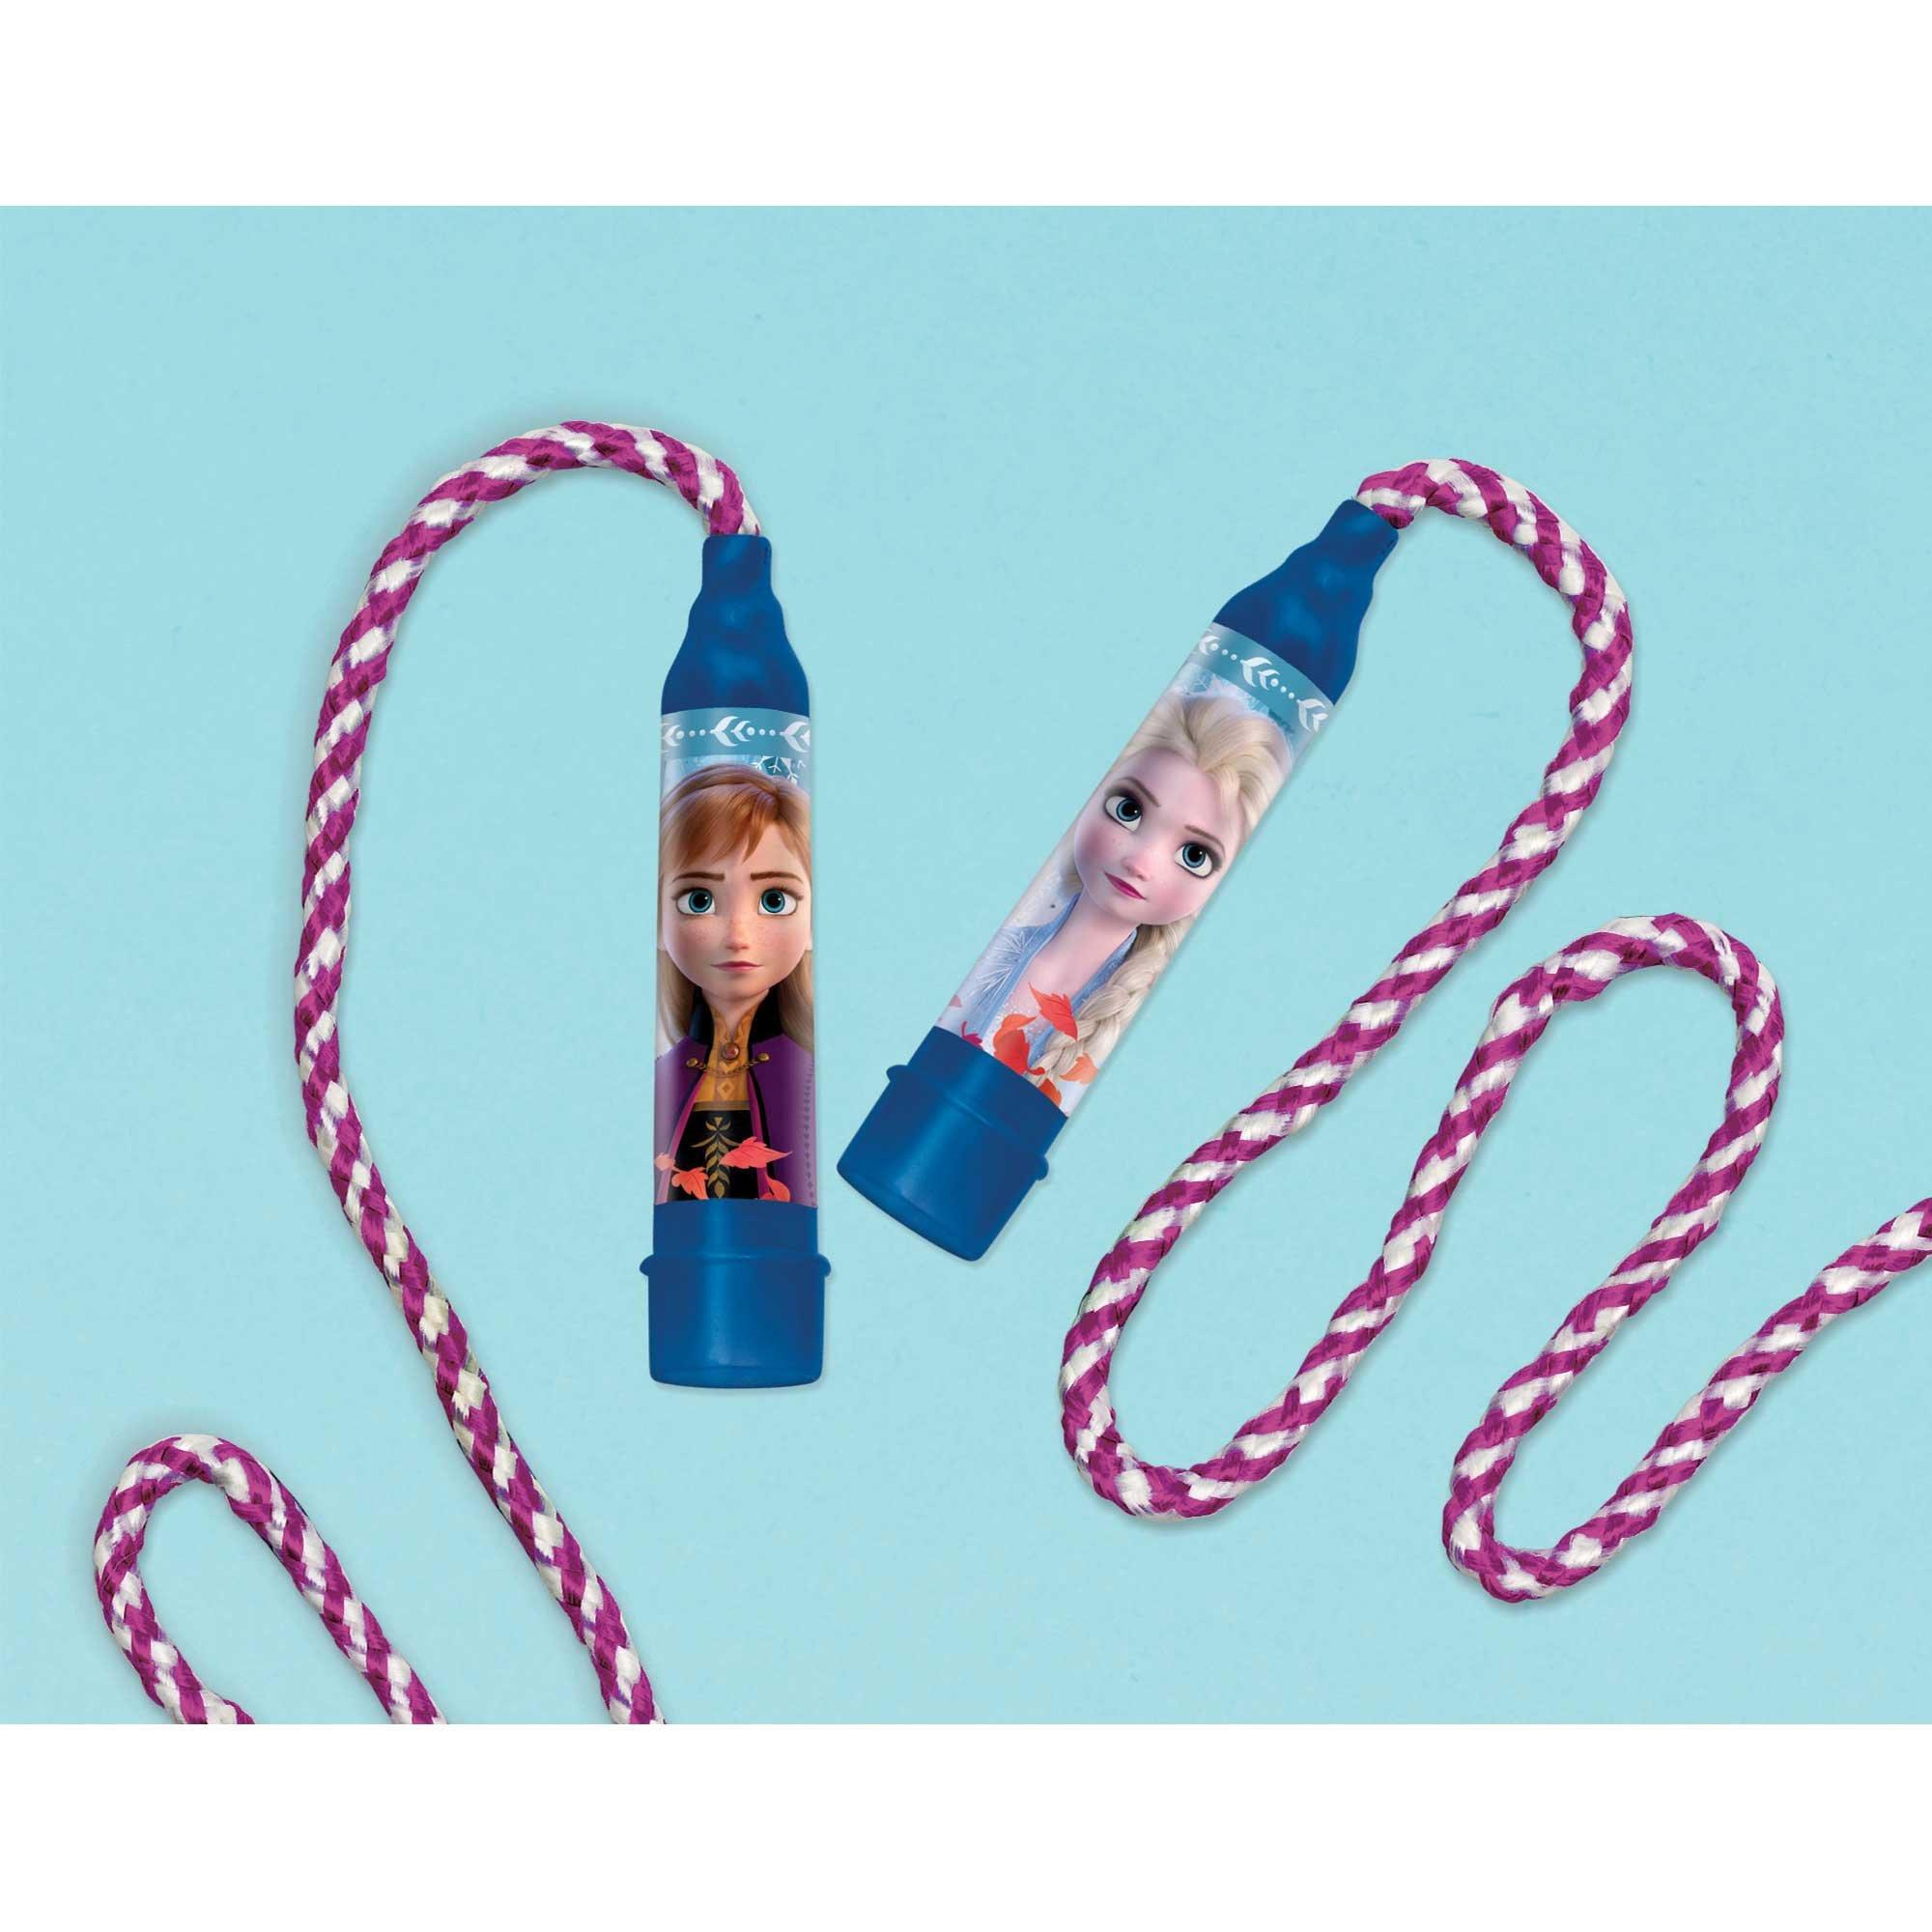 Frozen 2 Jump Rope